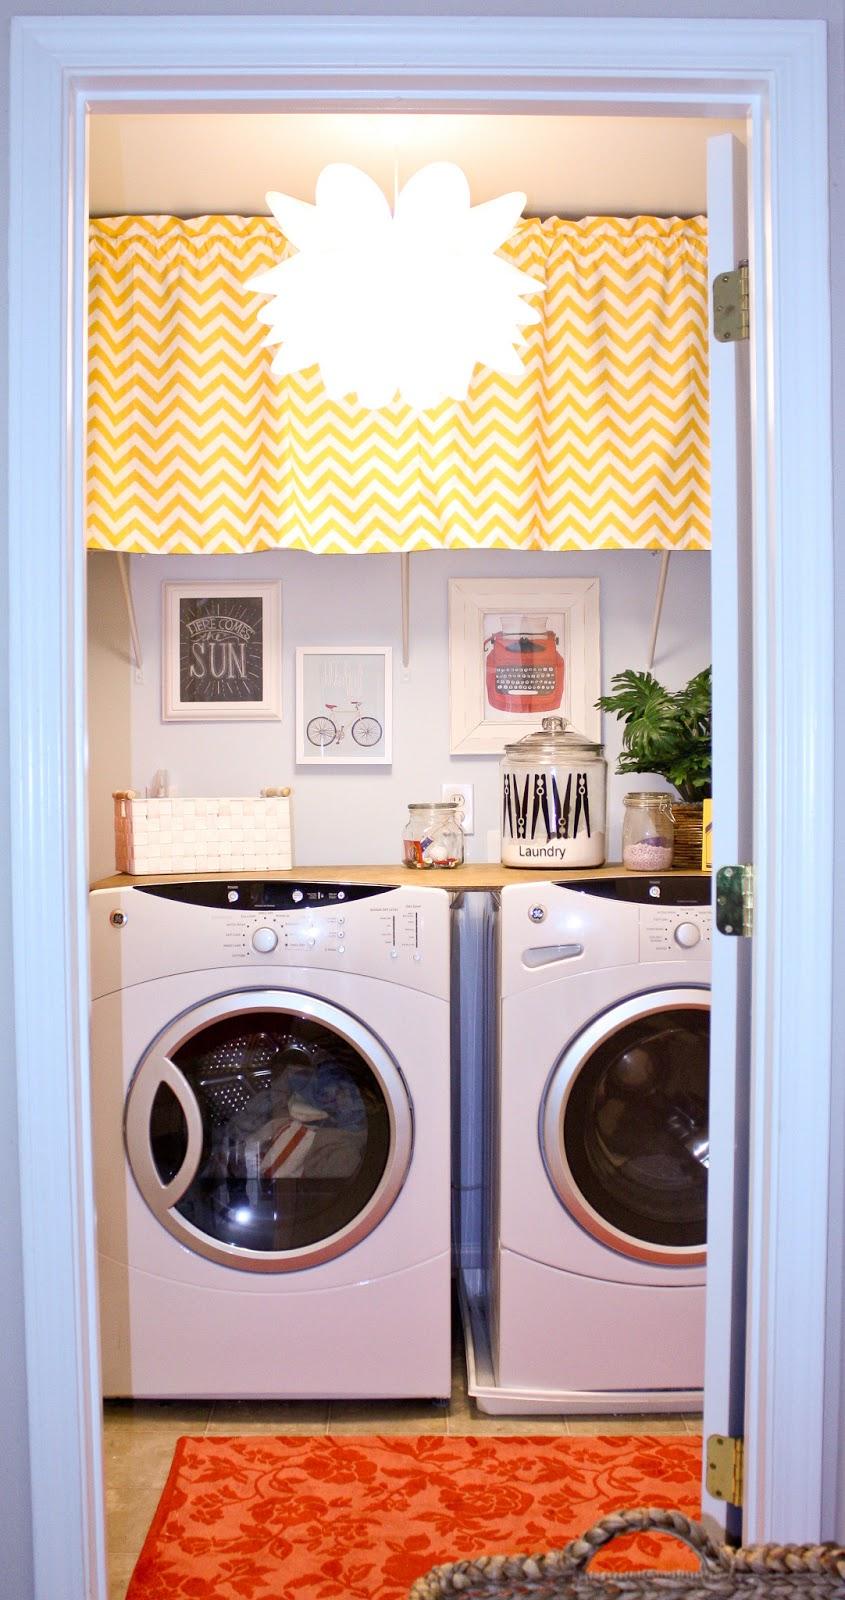 Hoot designs laundry room makeover shanty 2 chic - Small laundry room ideas ...